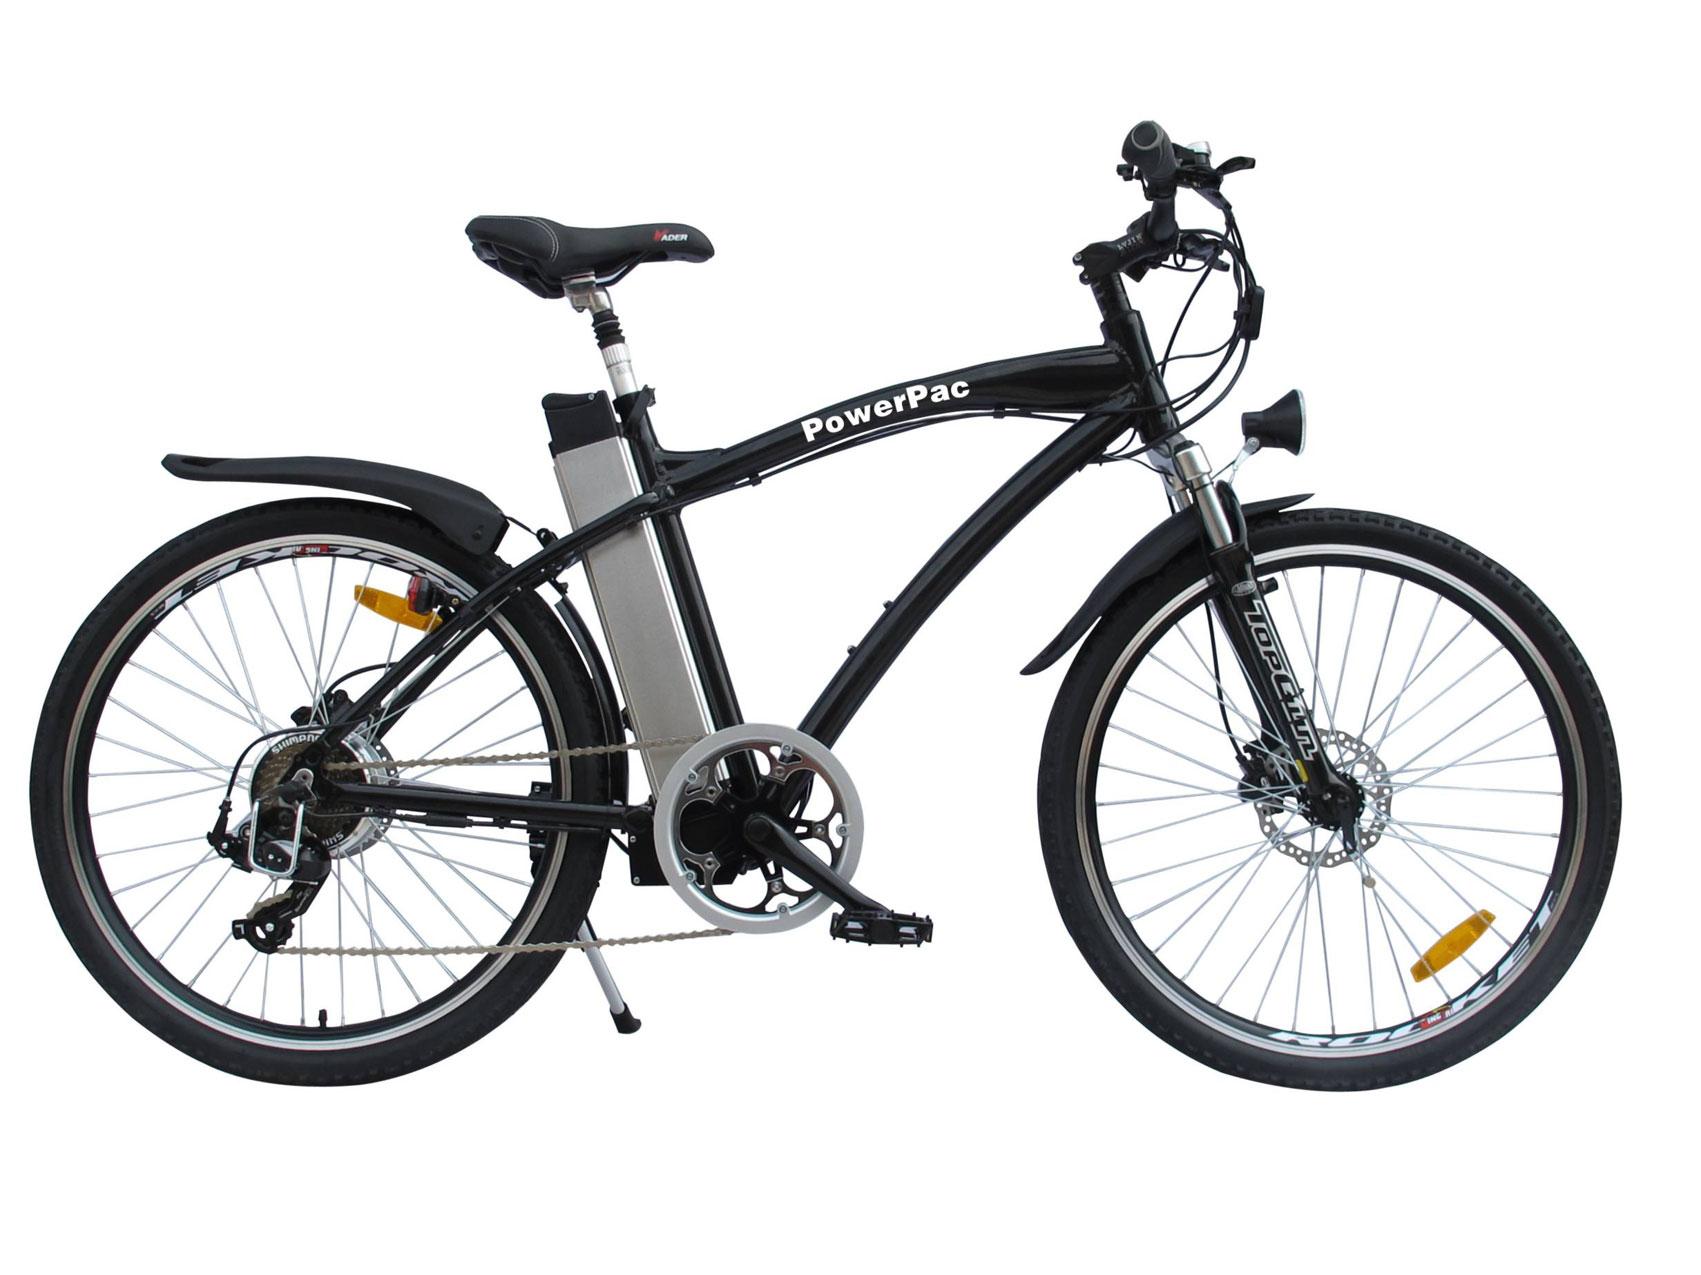 Powerpac Elektrofahrrad / E-Bike 36V Alu Mountainbike 26 Zoll - bei ...